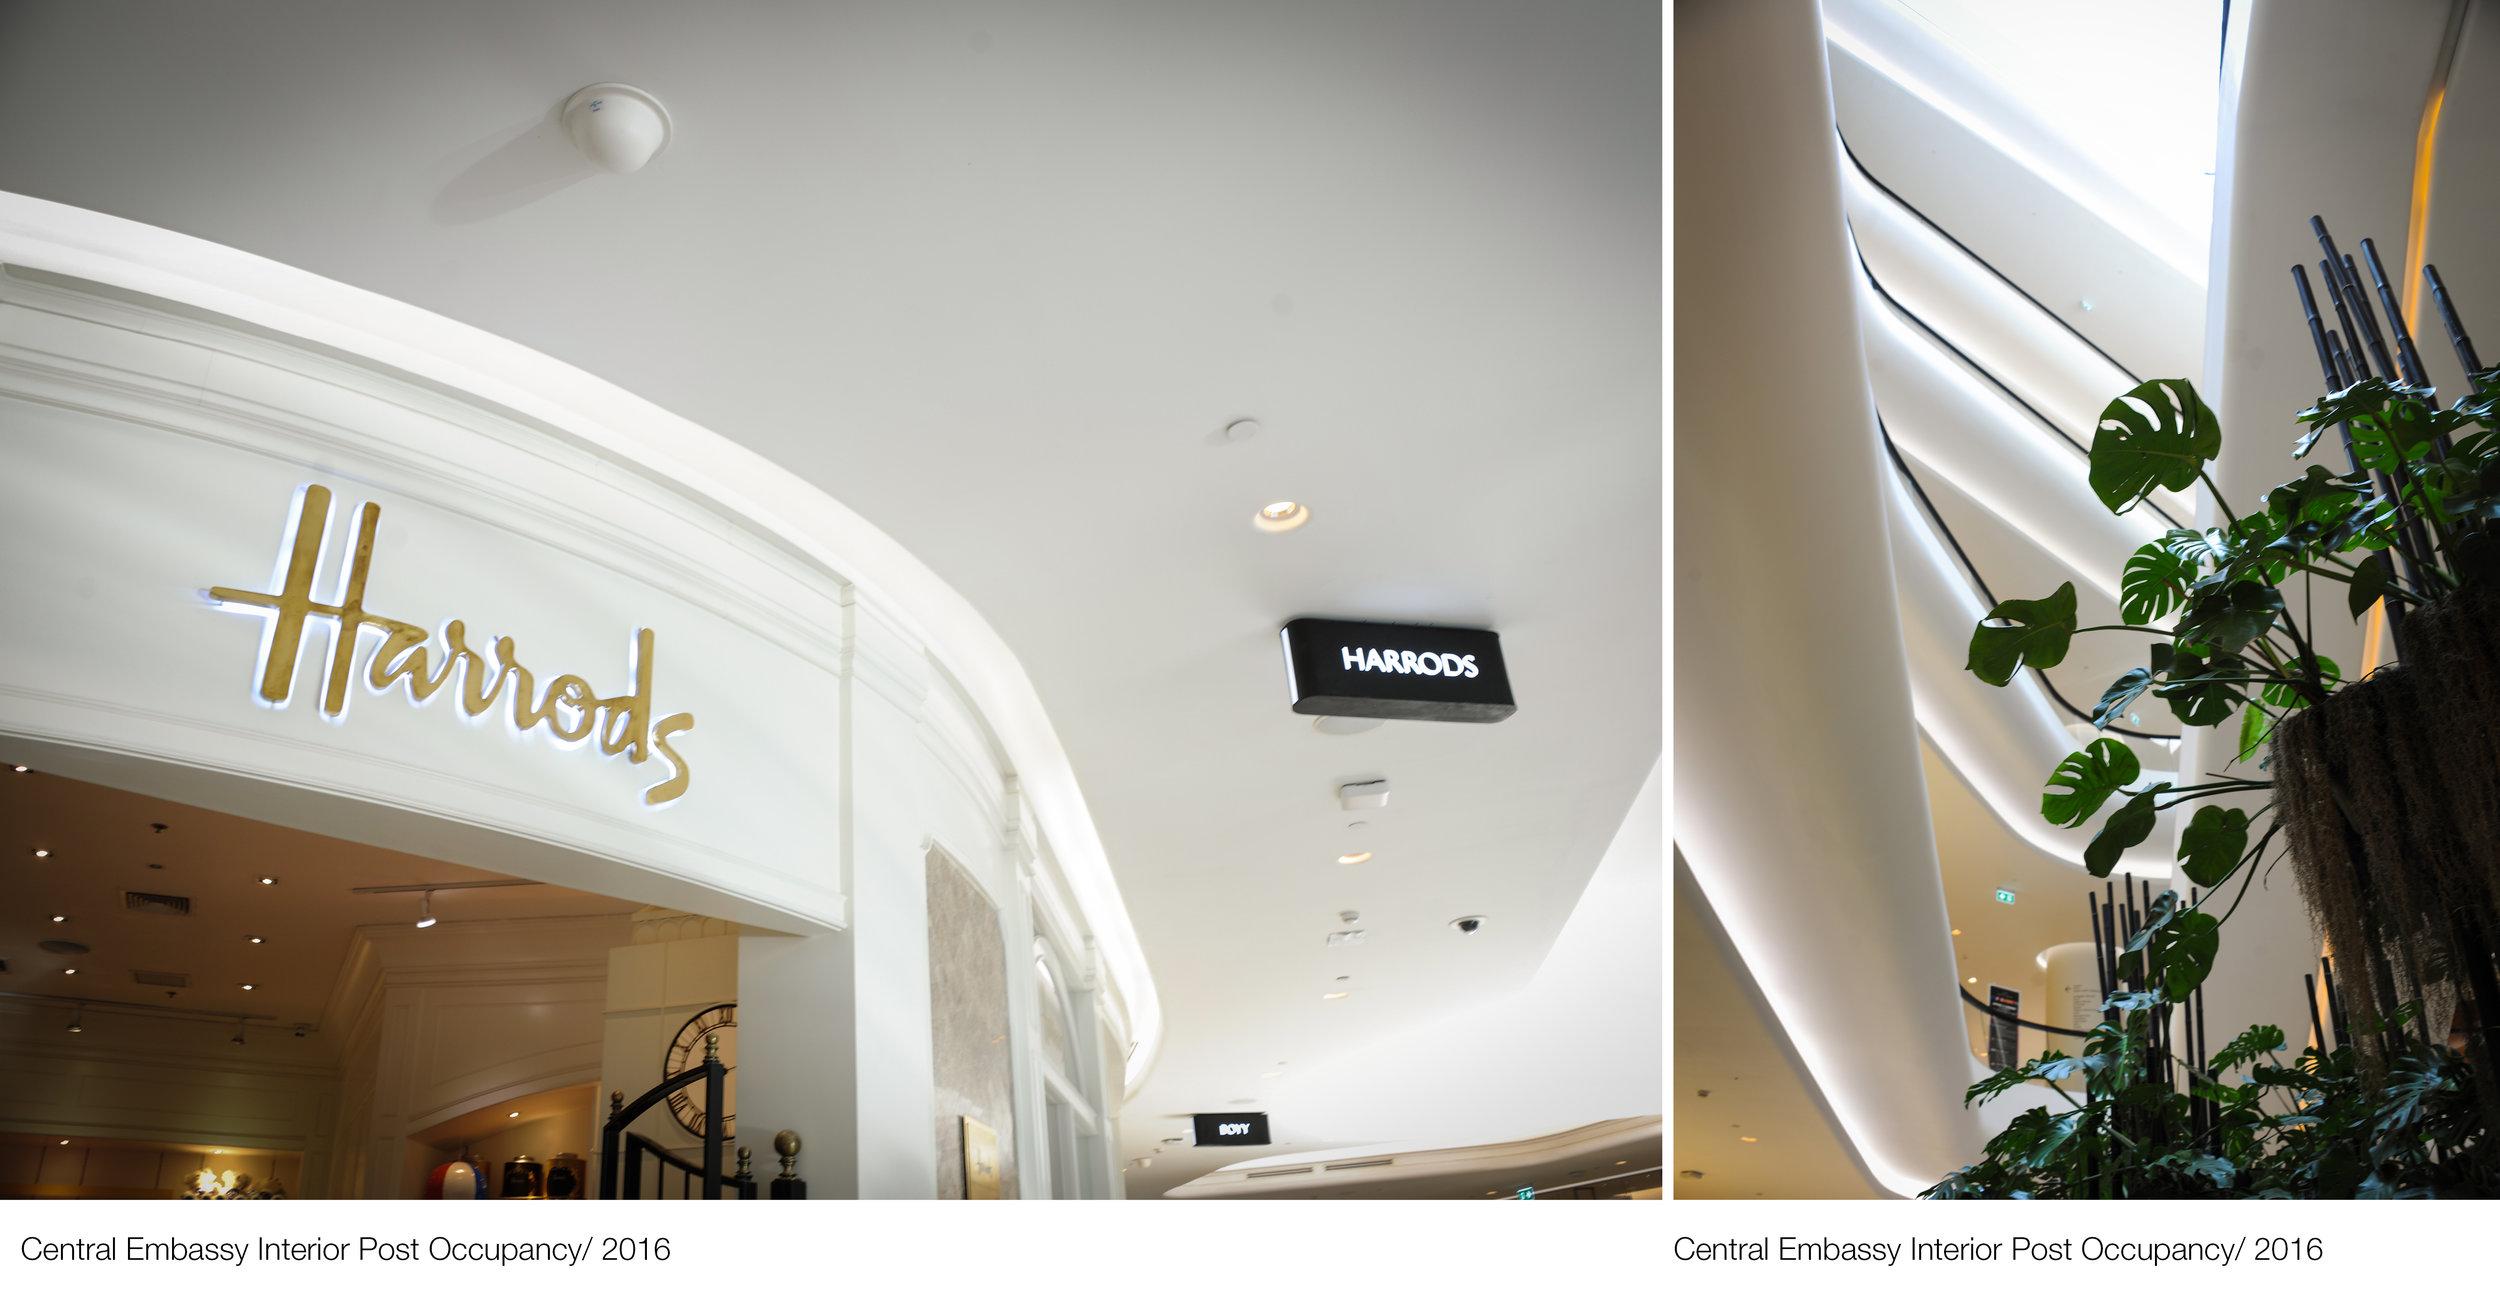 © Copyright Studio DS 2018 - Central Embassy Interior Design Post Occupancy Visual 2